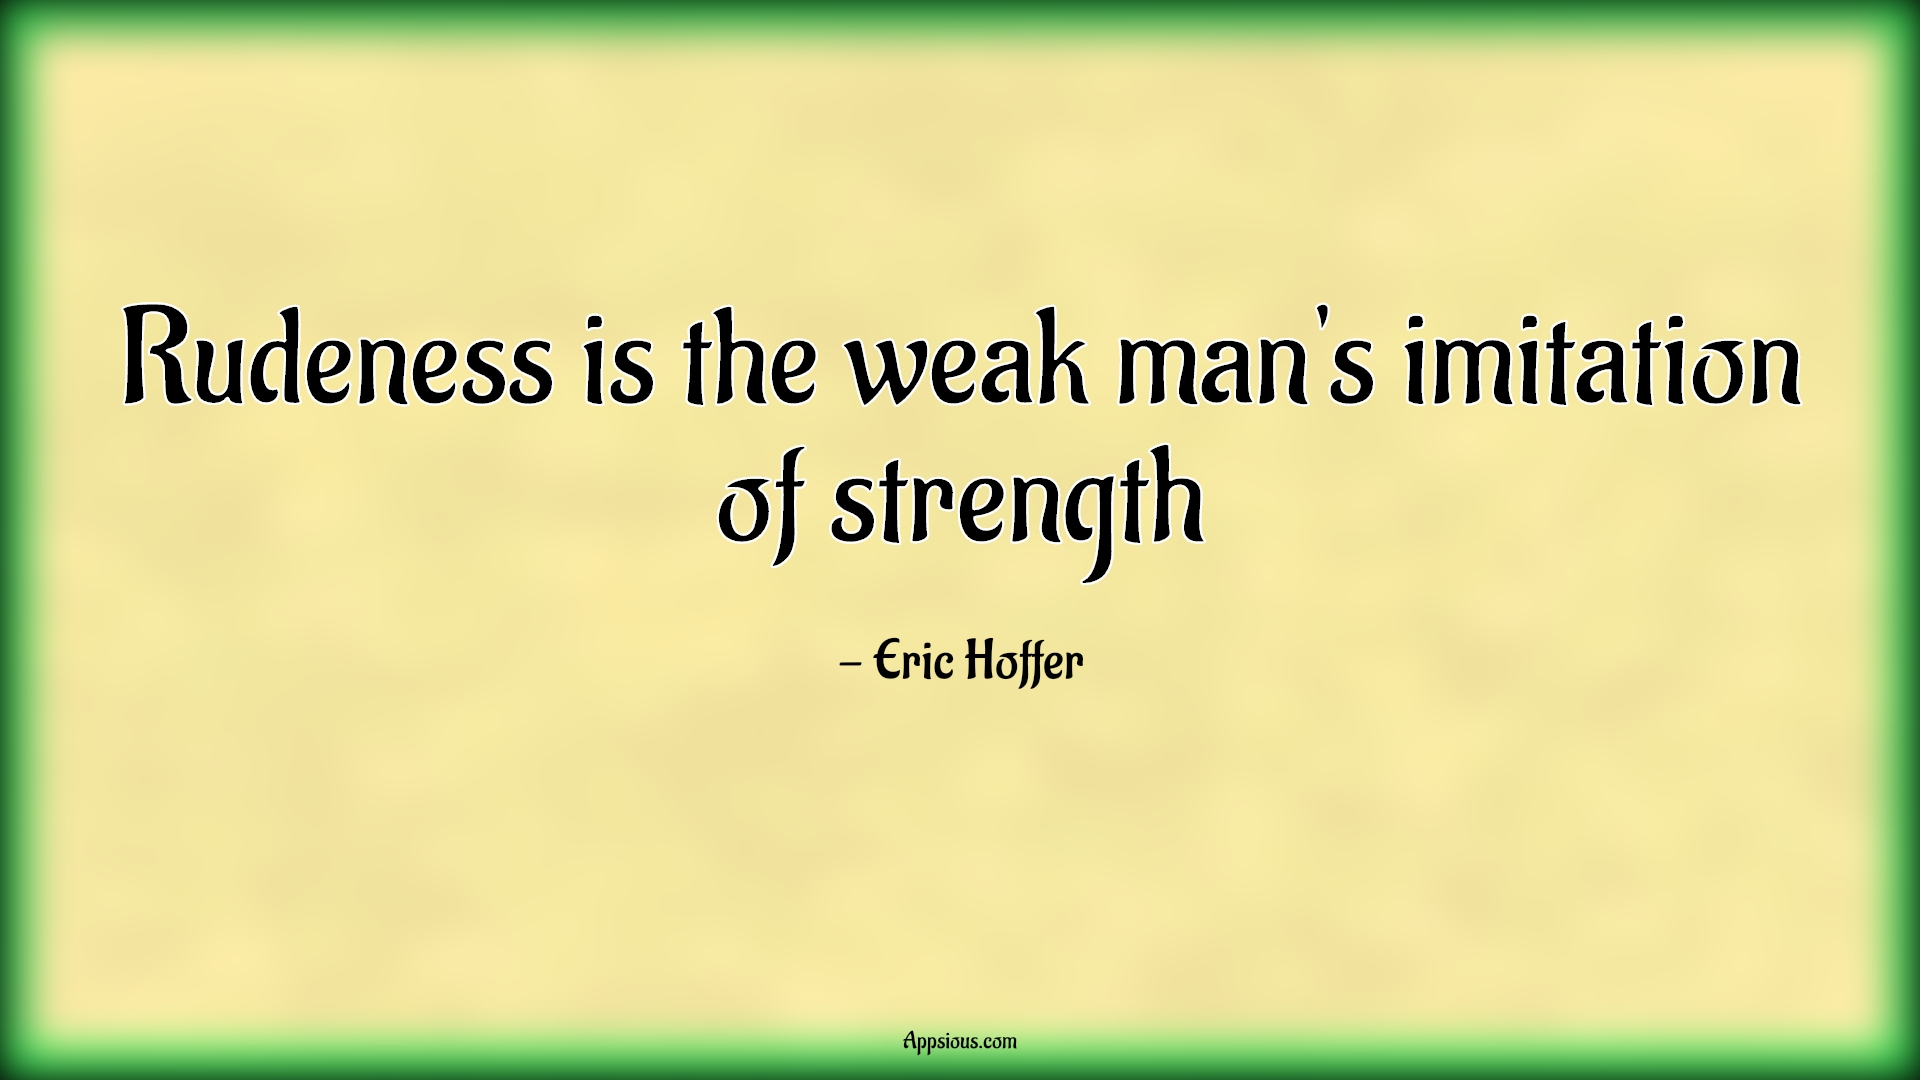 Rudeness is the weak man's imitation of strength